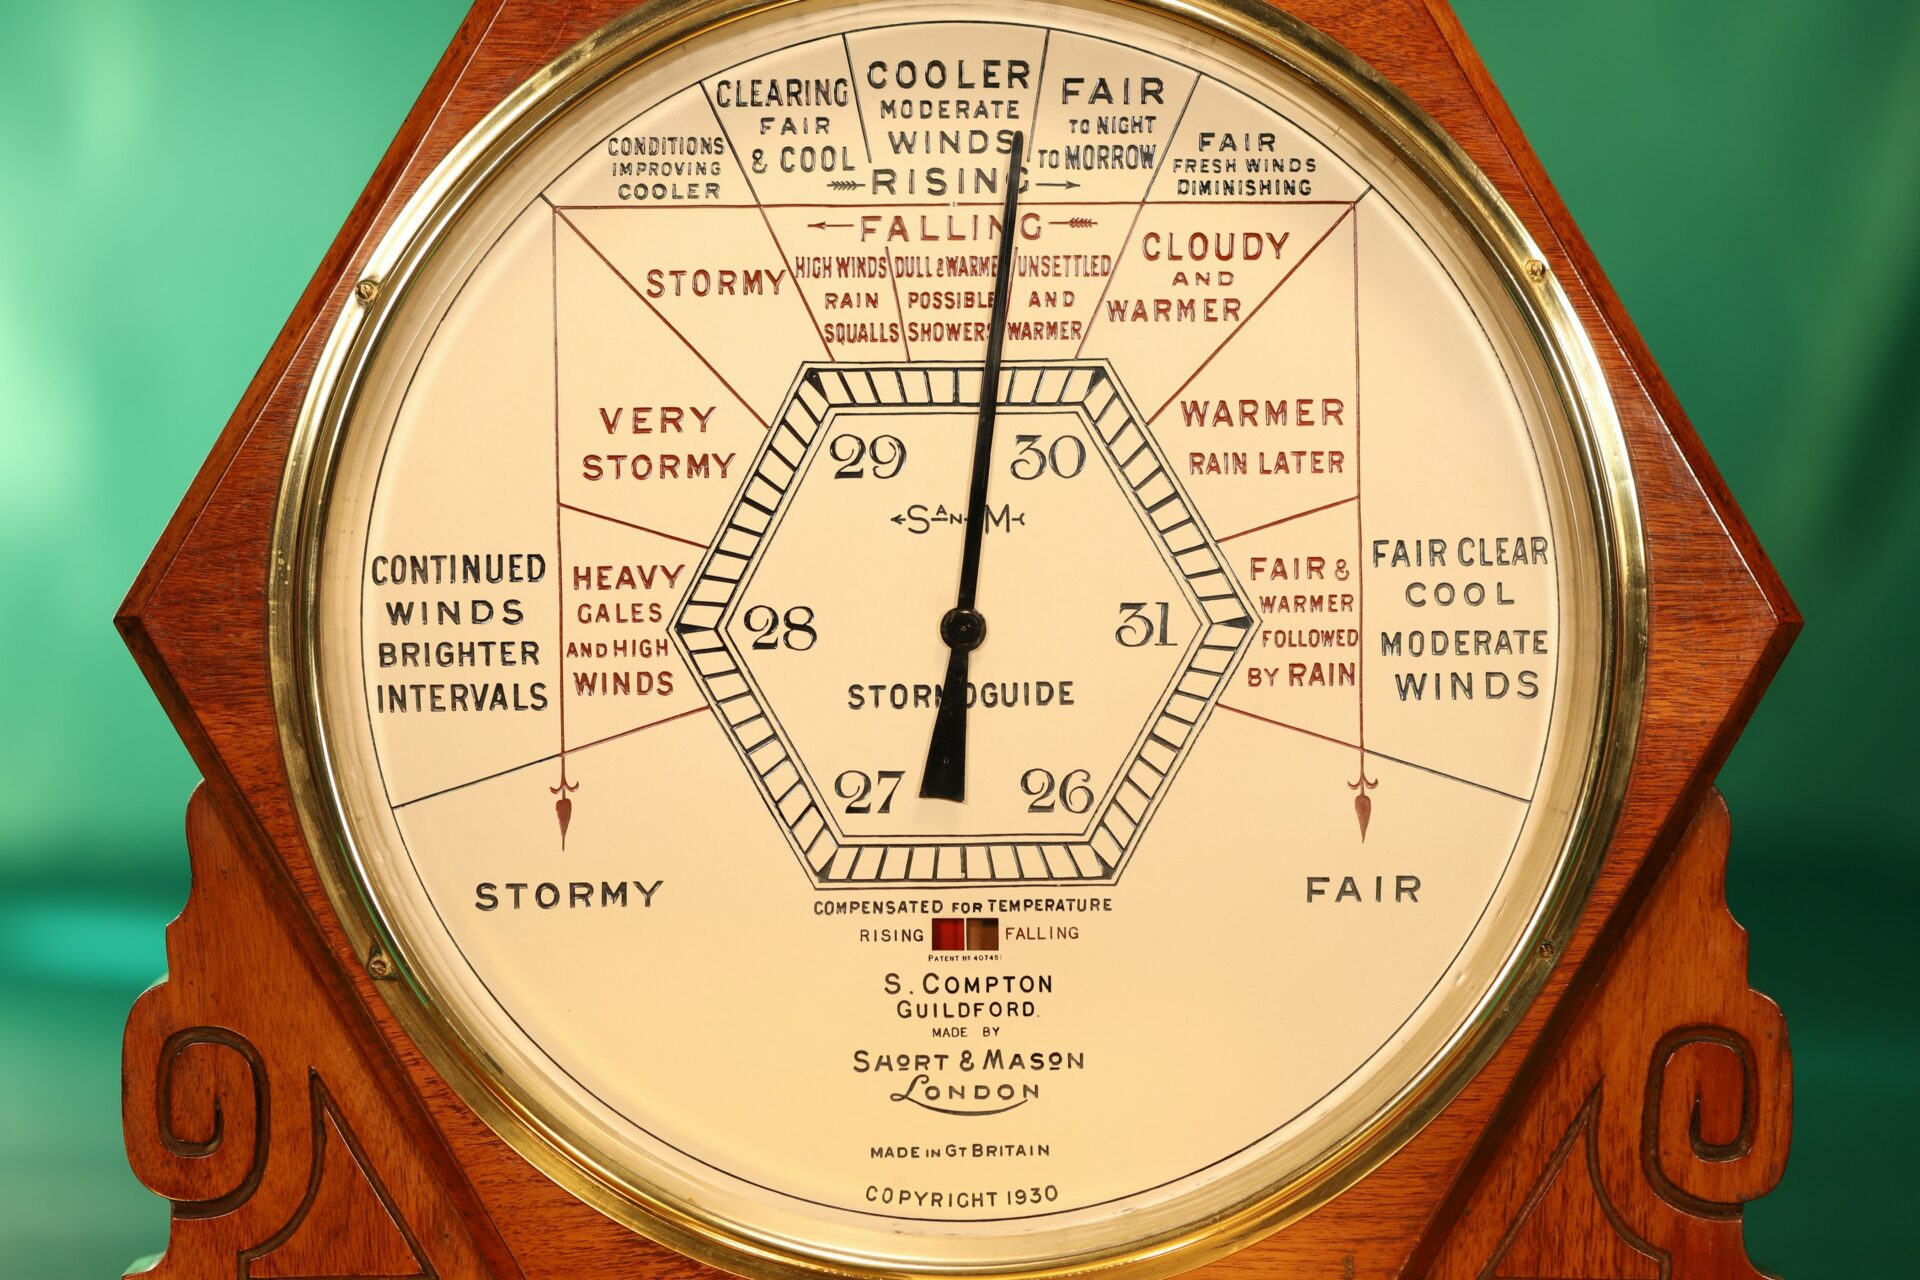 Image of dial of Short & Mason Hexagonal Stormoguide Barometer c1935